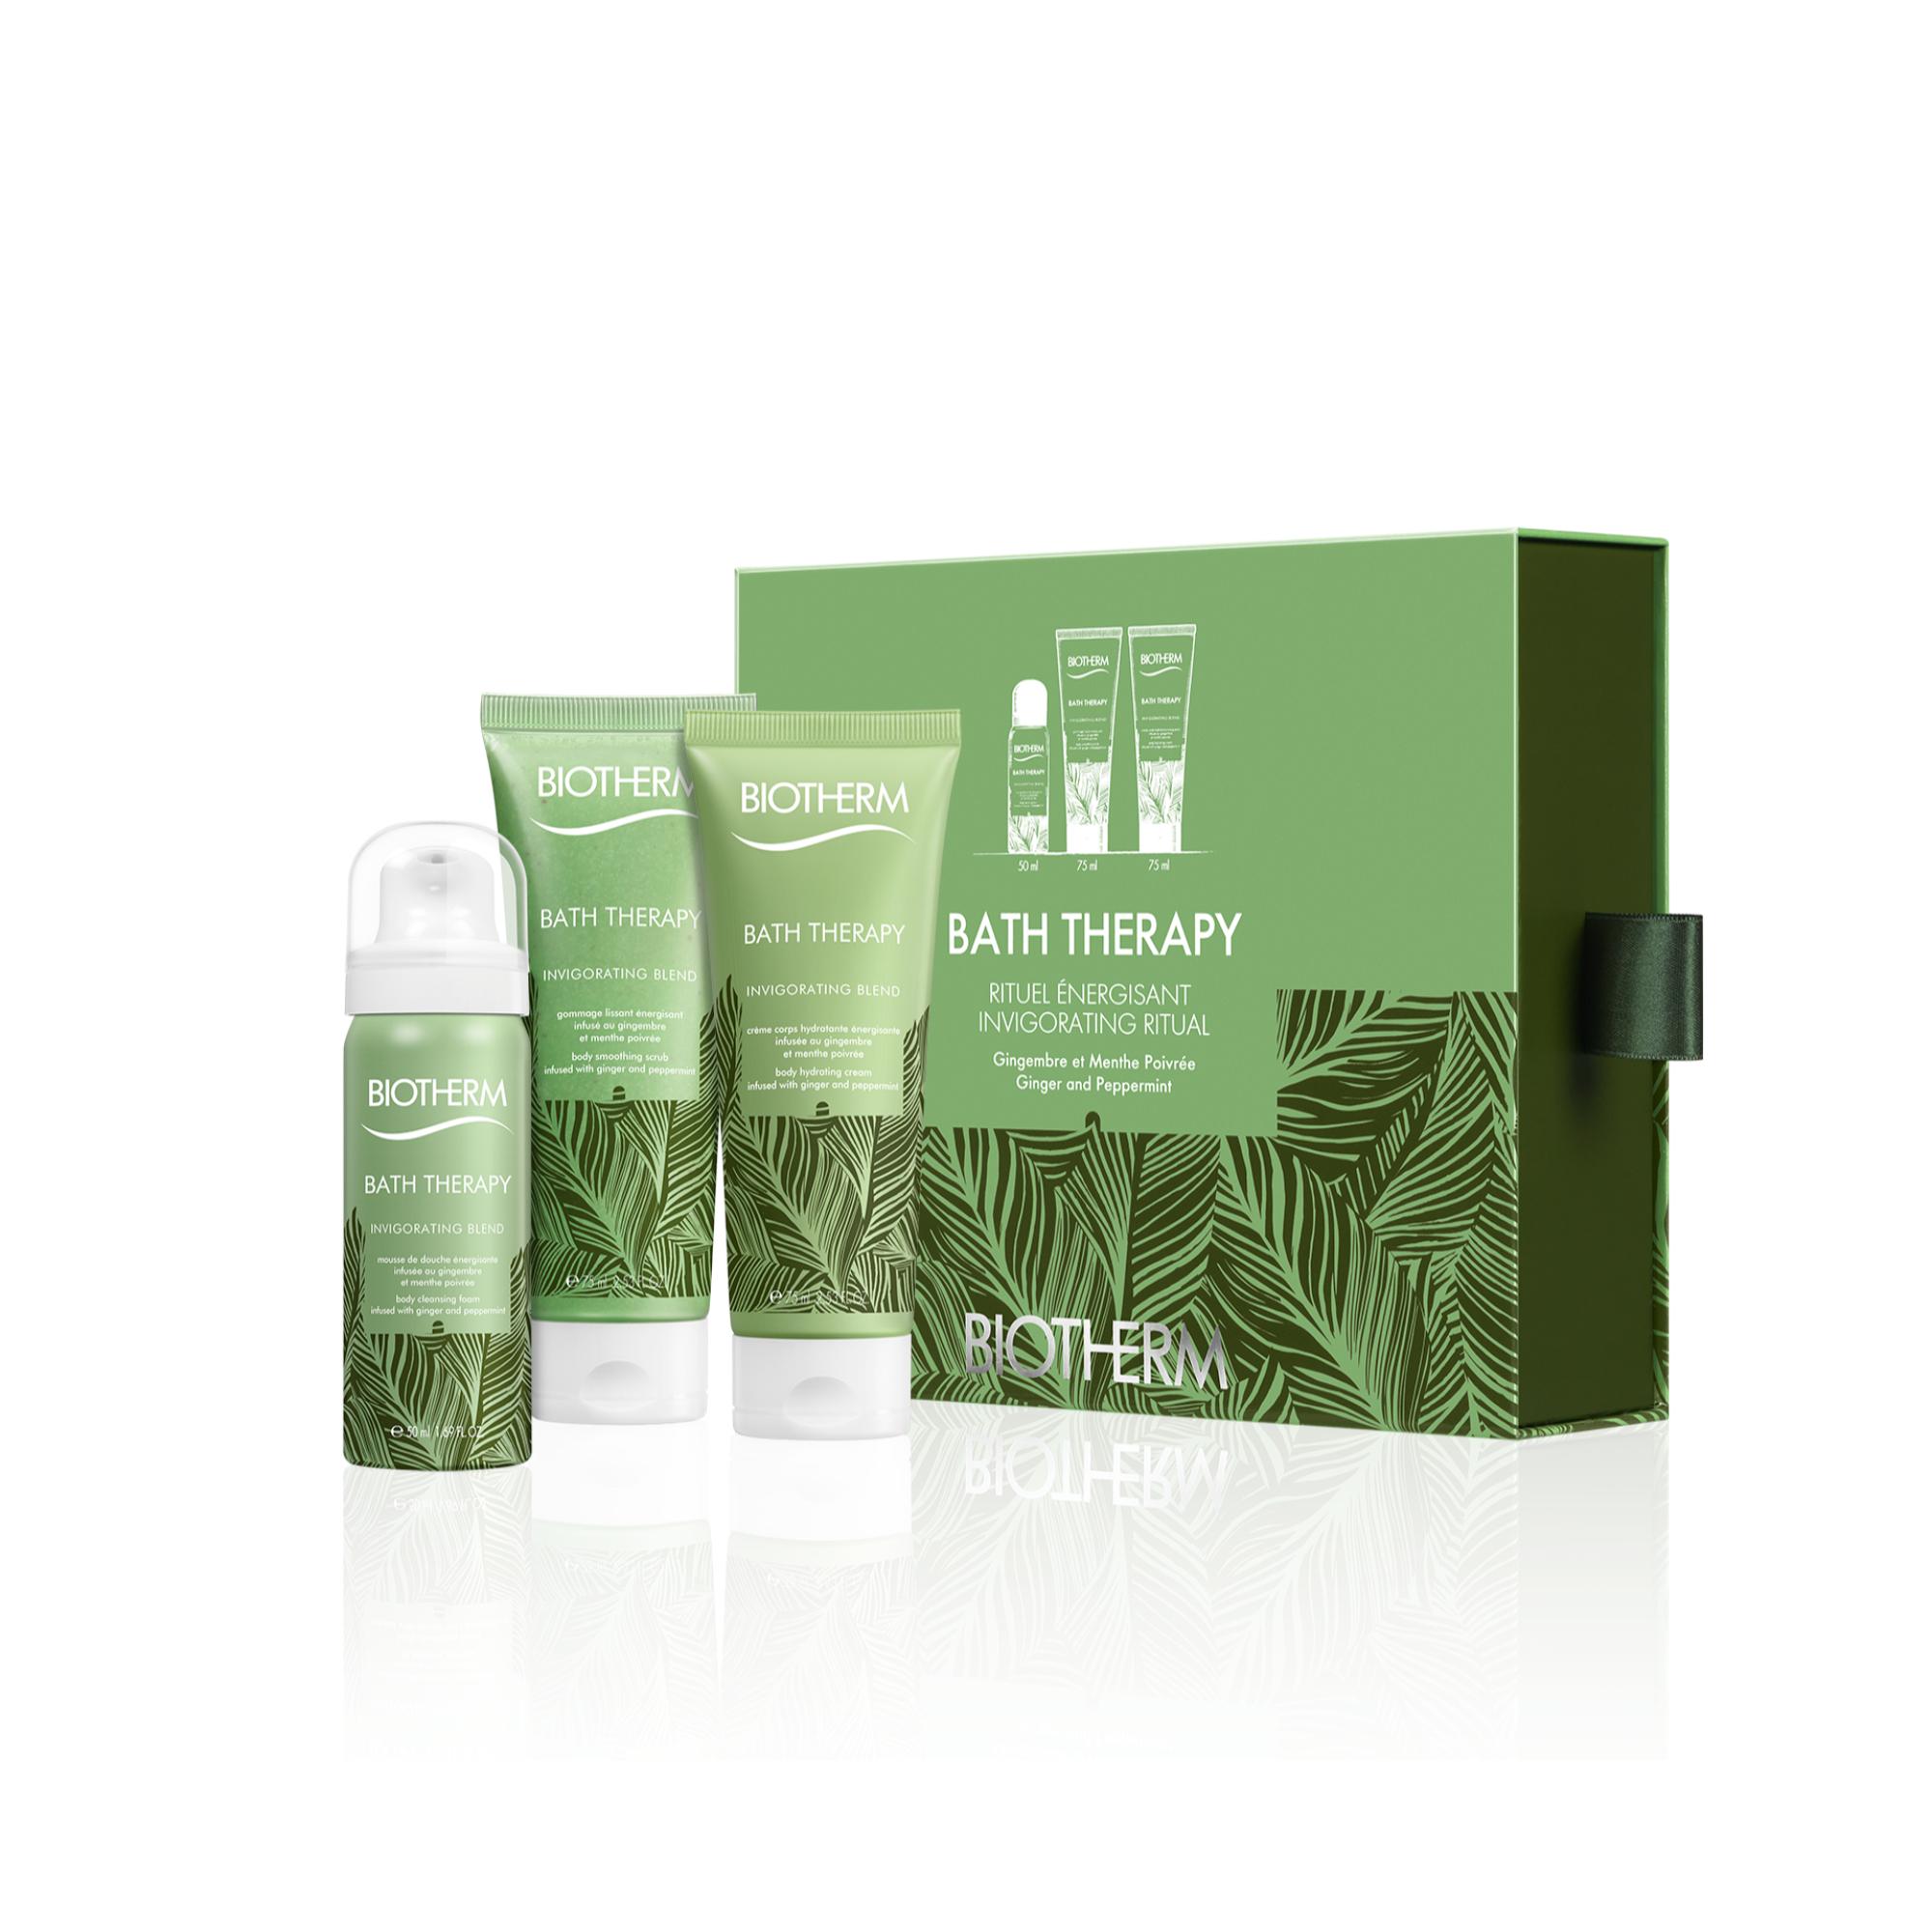 Bath Therapy Invigorative Blend Body Kit